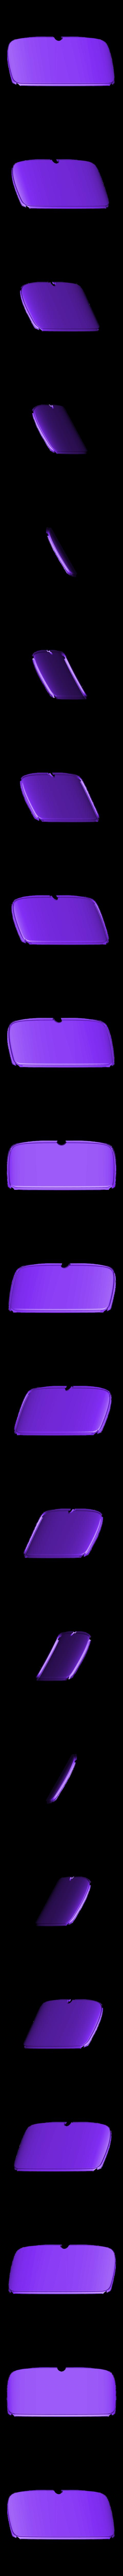 screen.STL Download free STL file Poppy Torso • 3D printable model, PoppyProject